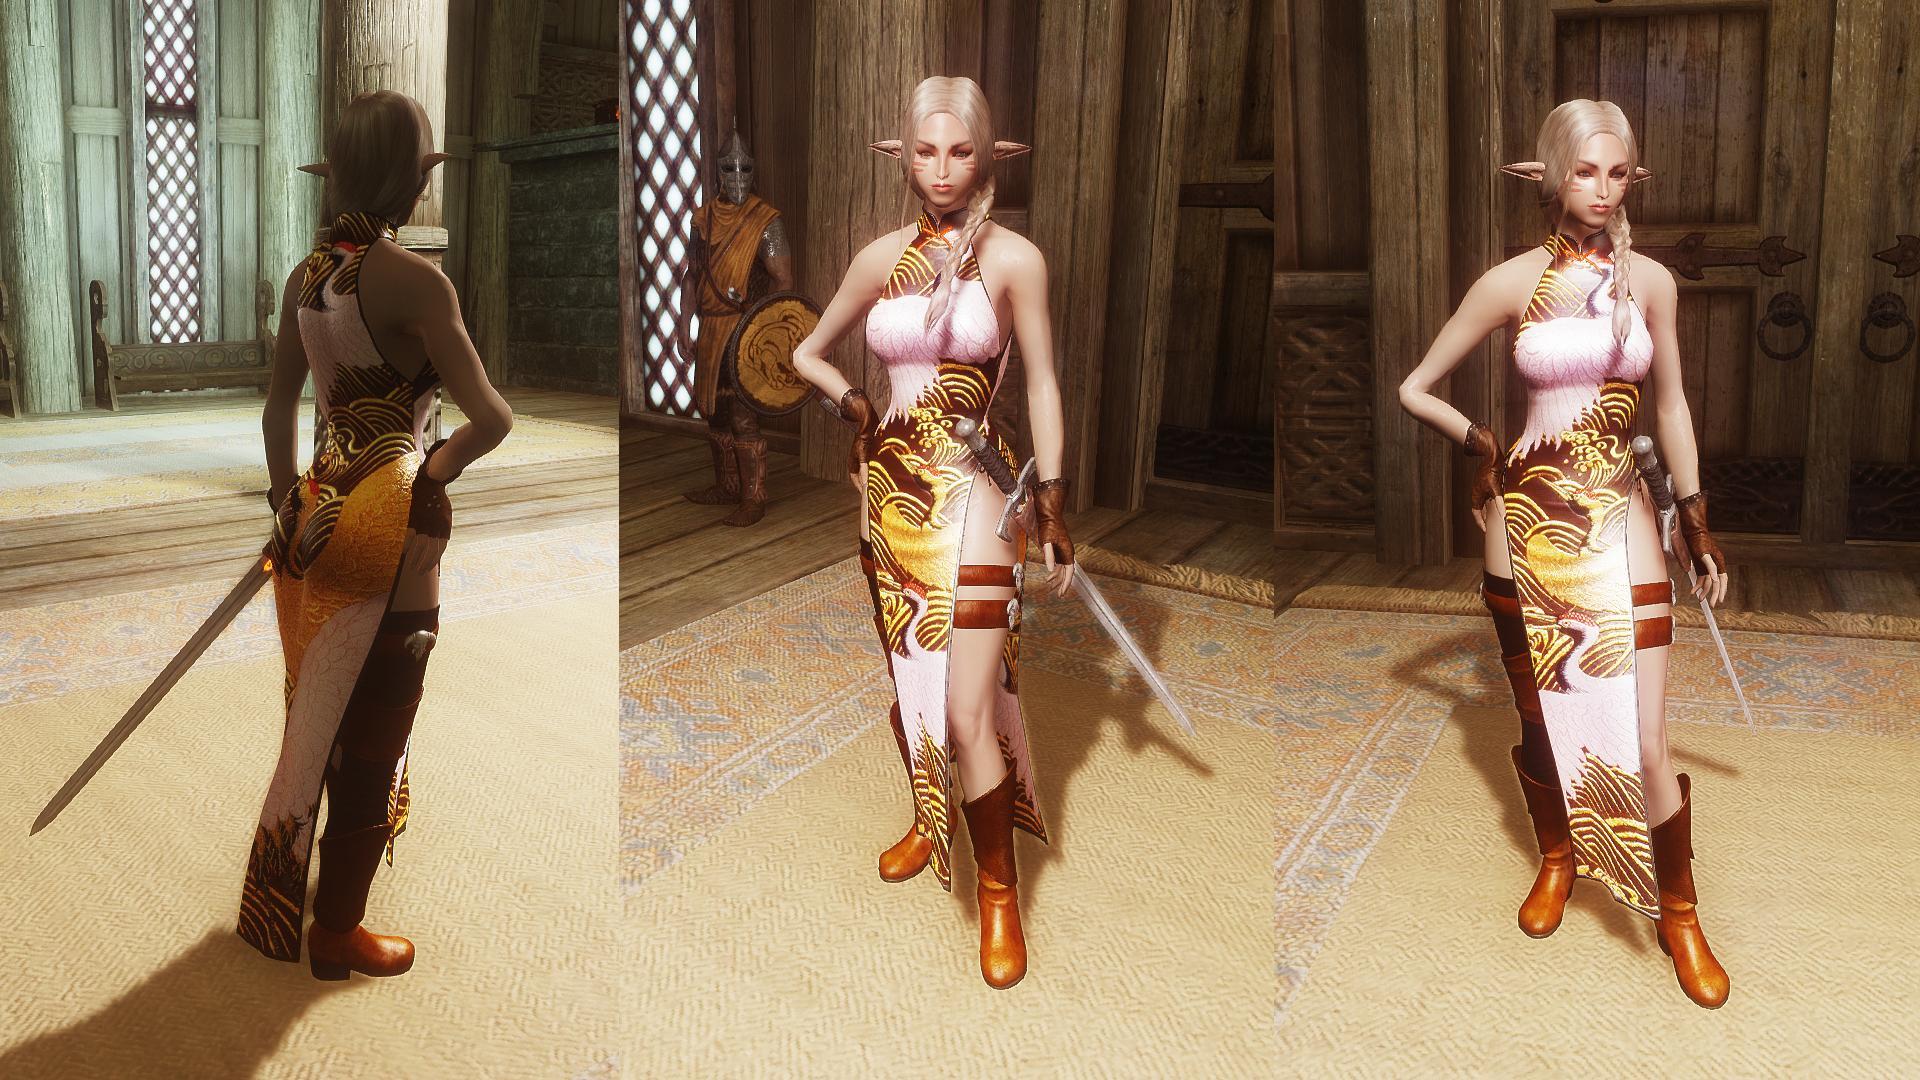 Pretty Female Idles at Skyrim Nexus   Skyrim mods and community HD Wallpaper